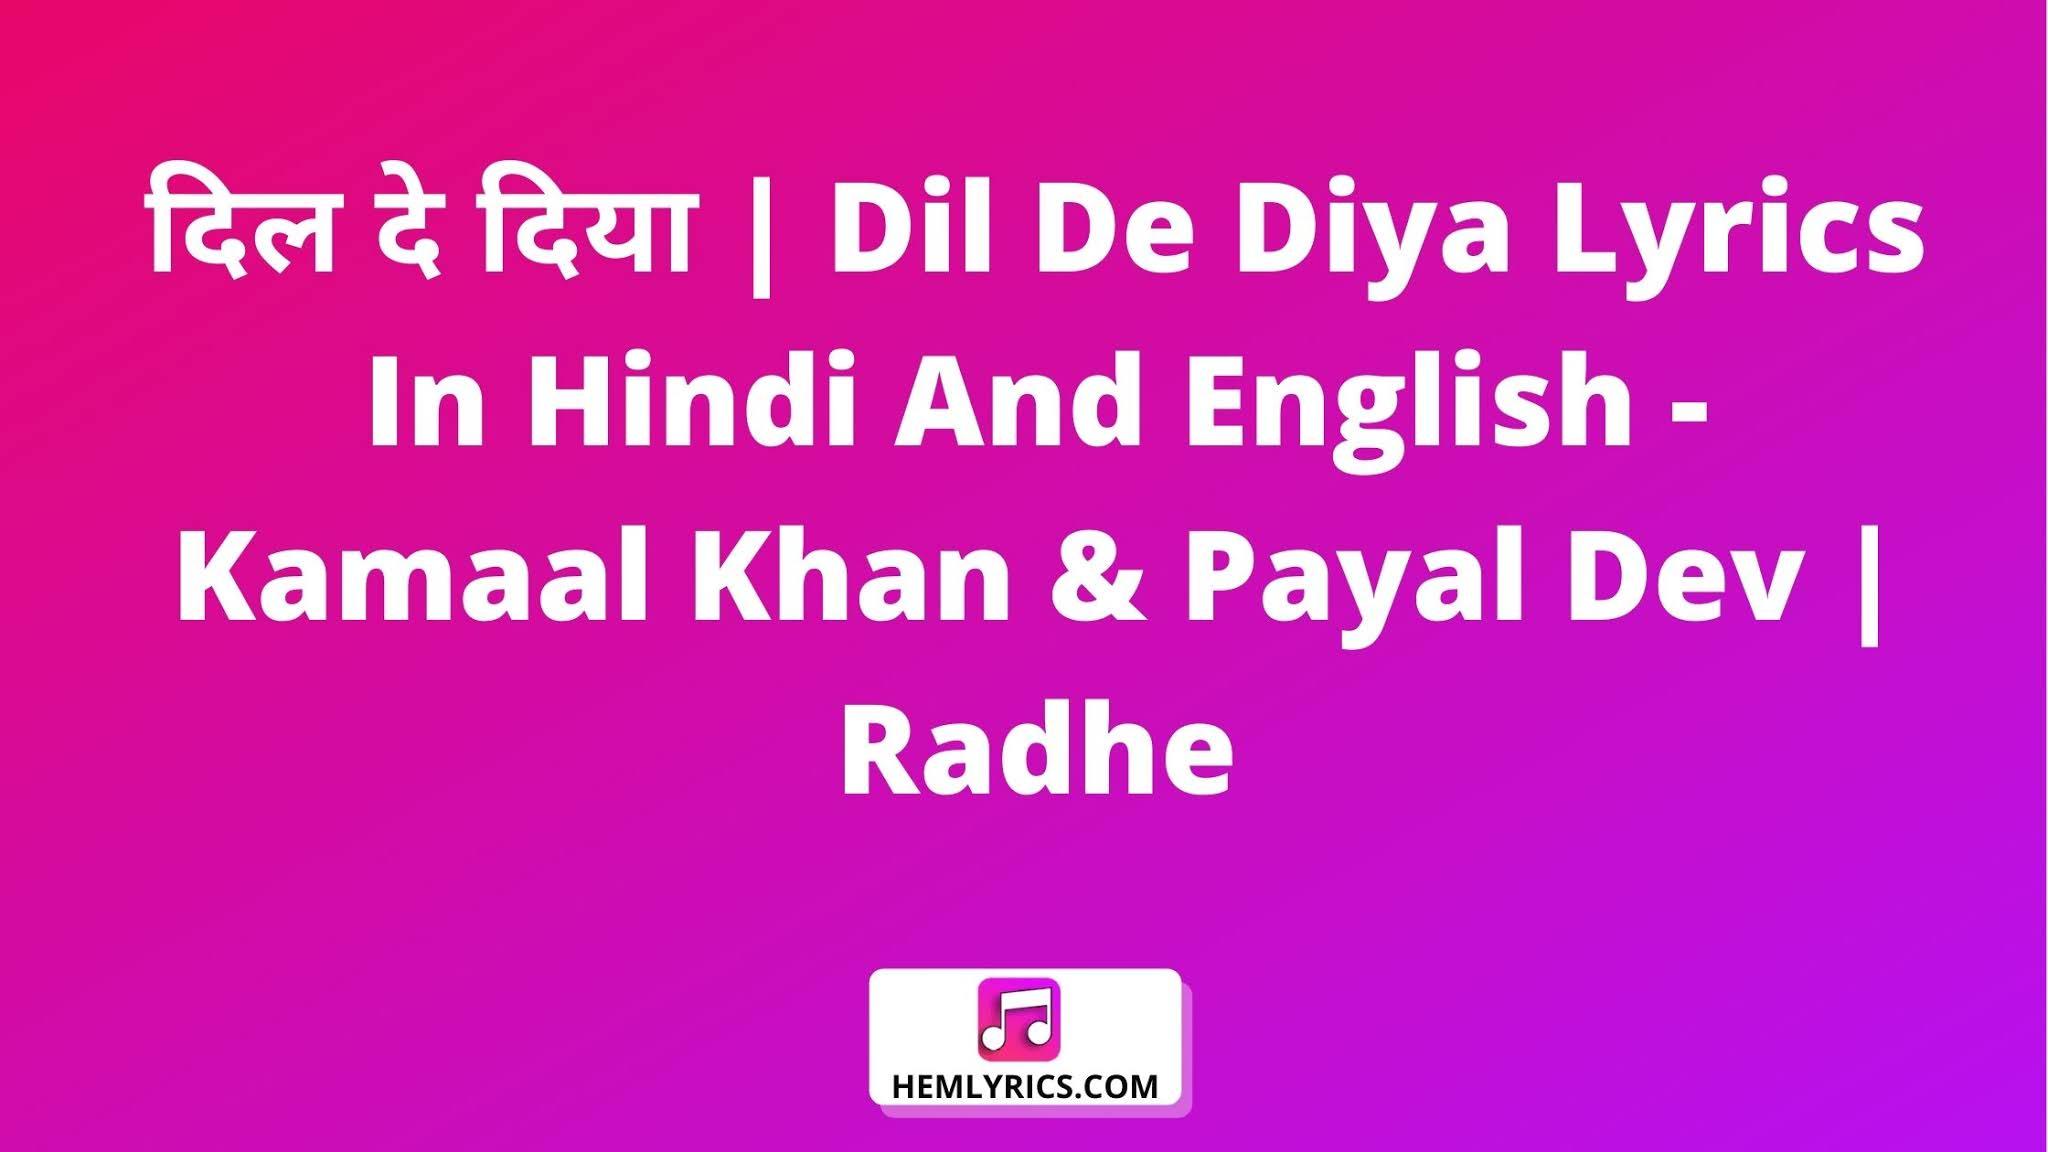 दिल दे दिया | Dil De Diya Lyrics In Hindi And English - Kamaal Khan & Payal Dev | Radhe